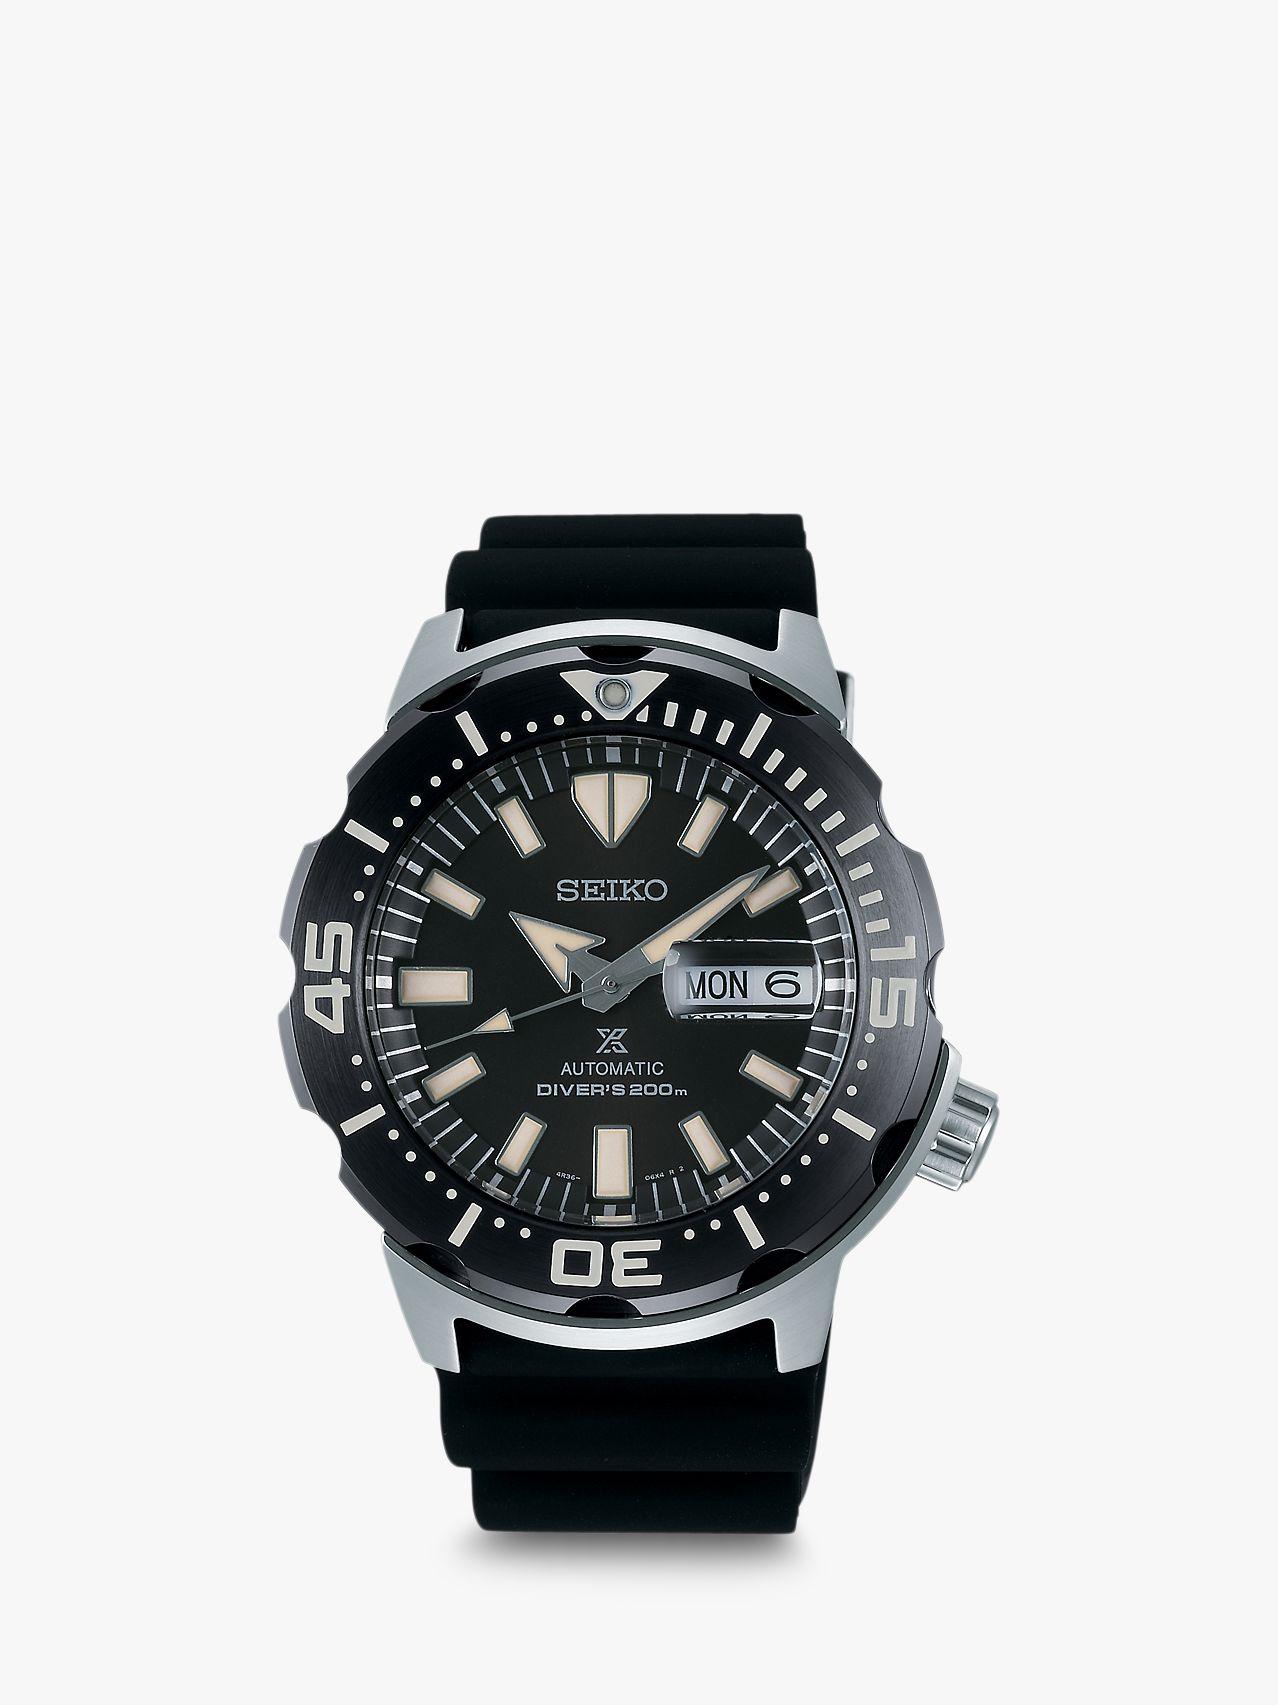 Seiko Seiko SRPD27K1 Men's Prospex Monster Divers Automatic Day Date Silicone Strap Watch, Black